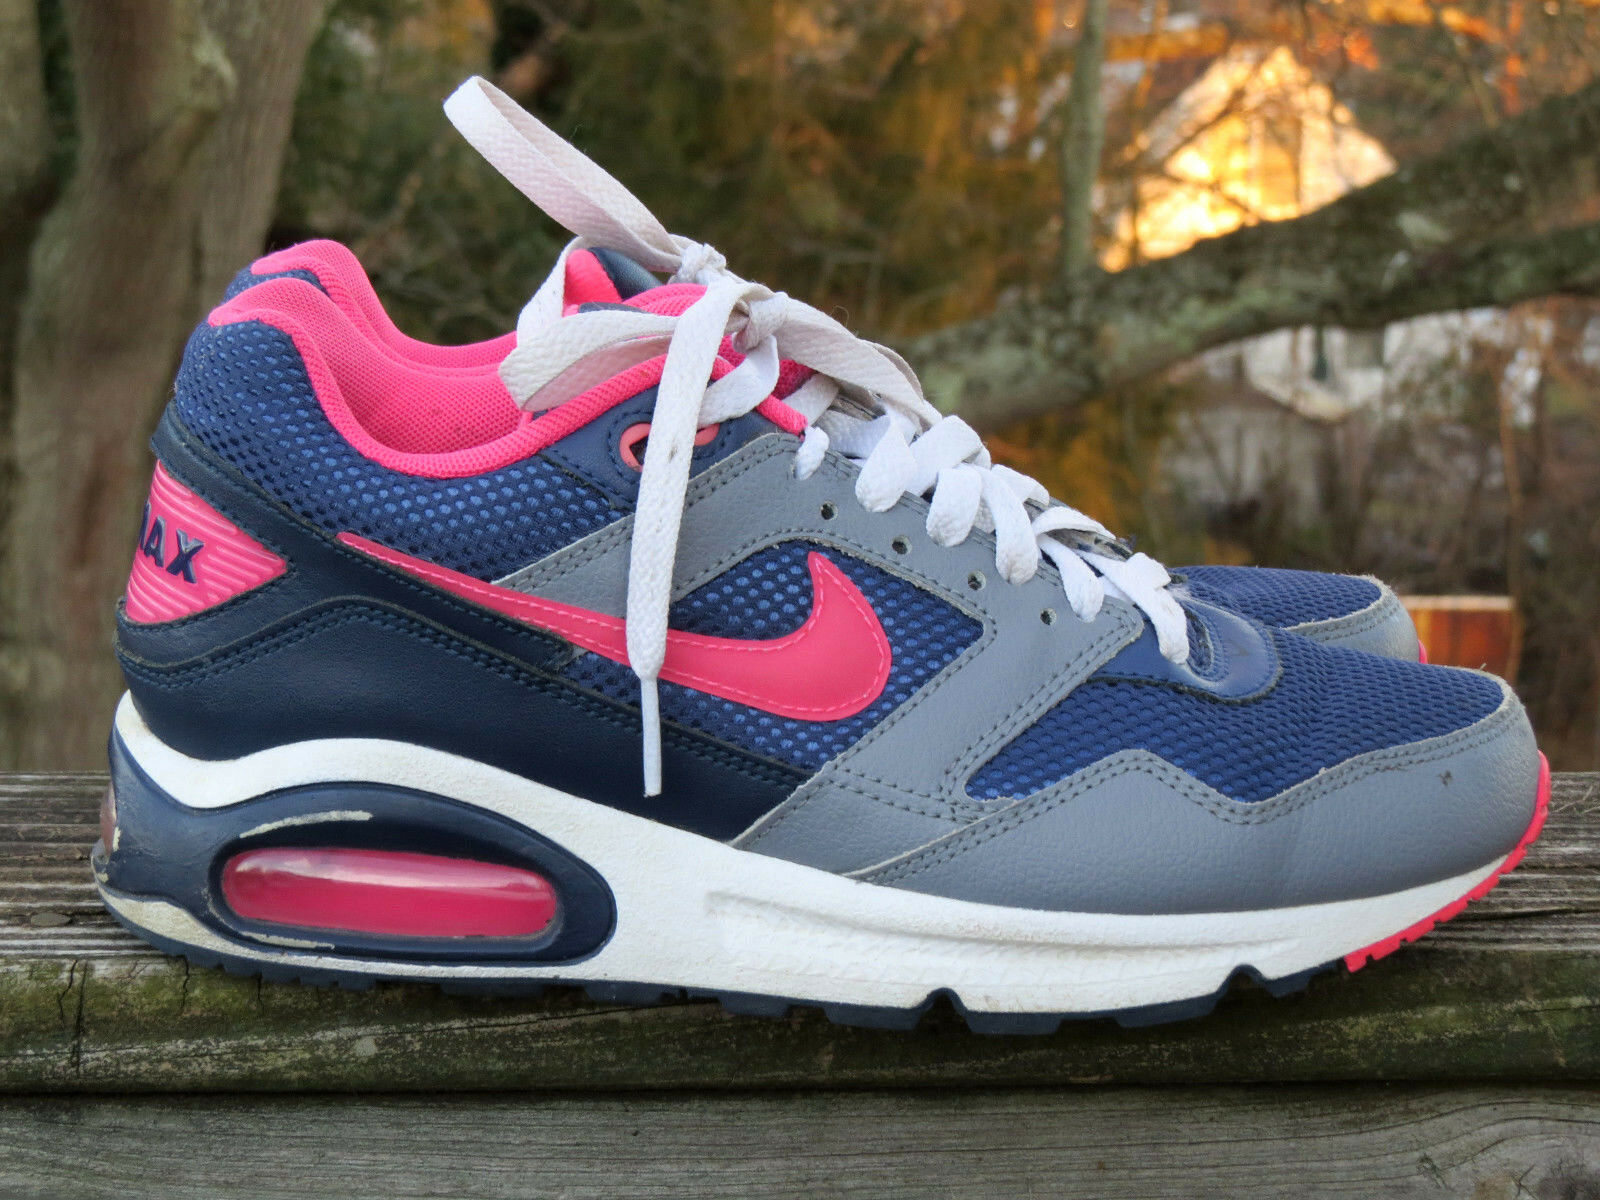 711d54f9546f NIKE AIR MAX Jordans Jordans Jordans PINK Navigate Running Walking Athletic  Womens Shoes Sz 8 6e9ce2